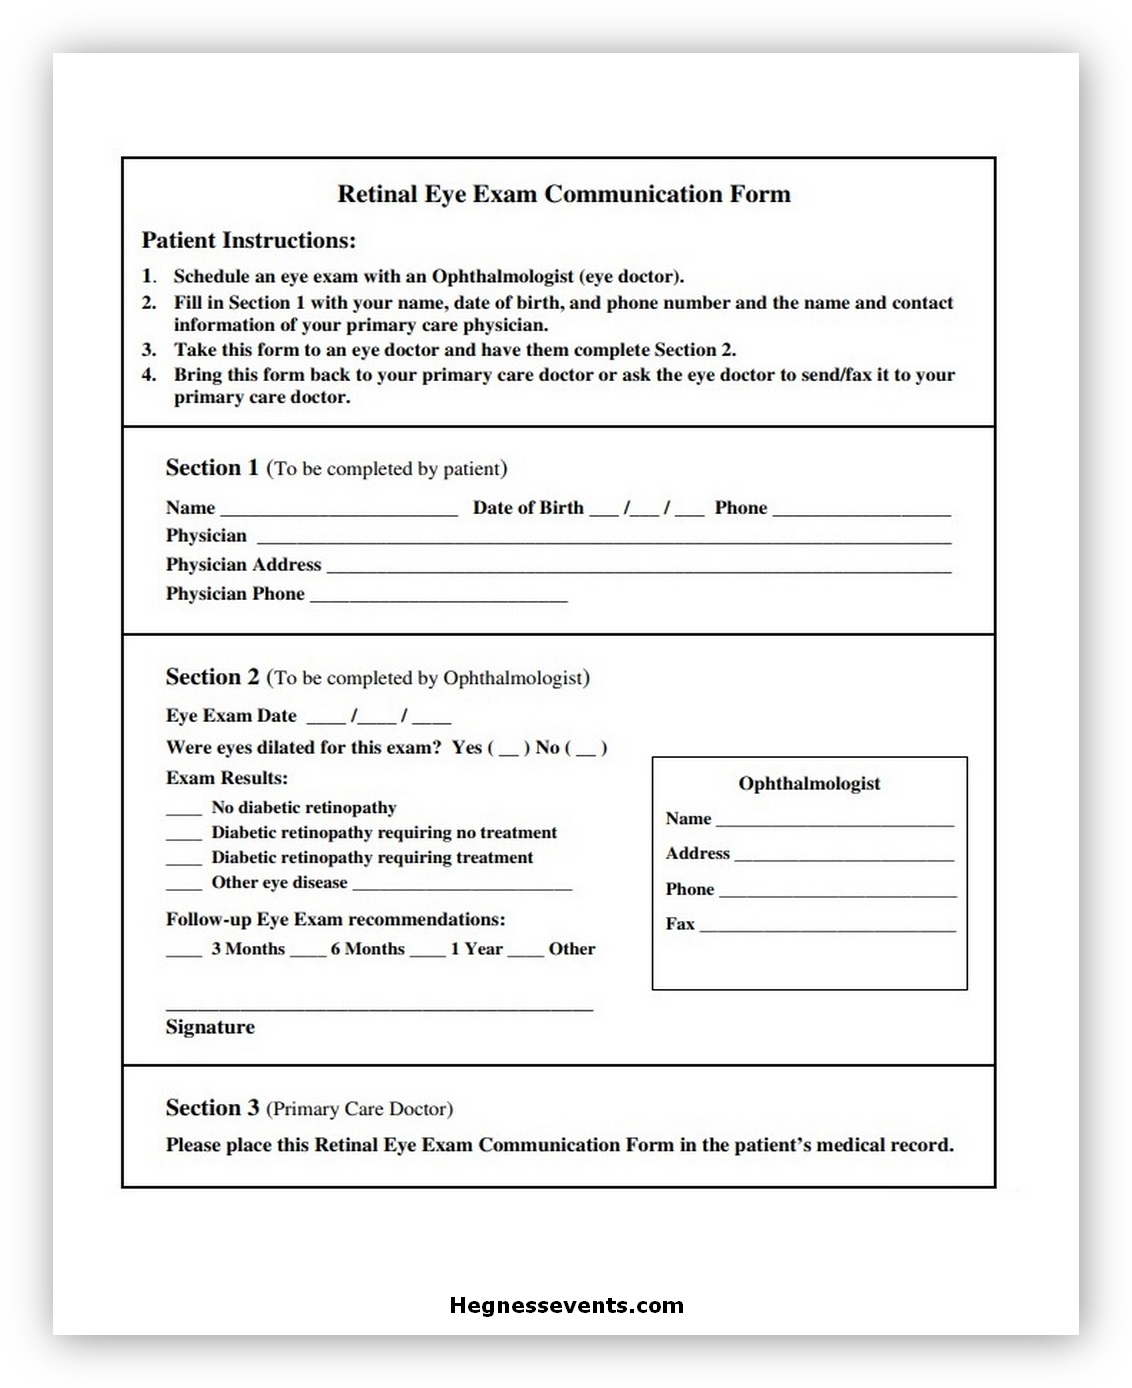 Exam Communication Form